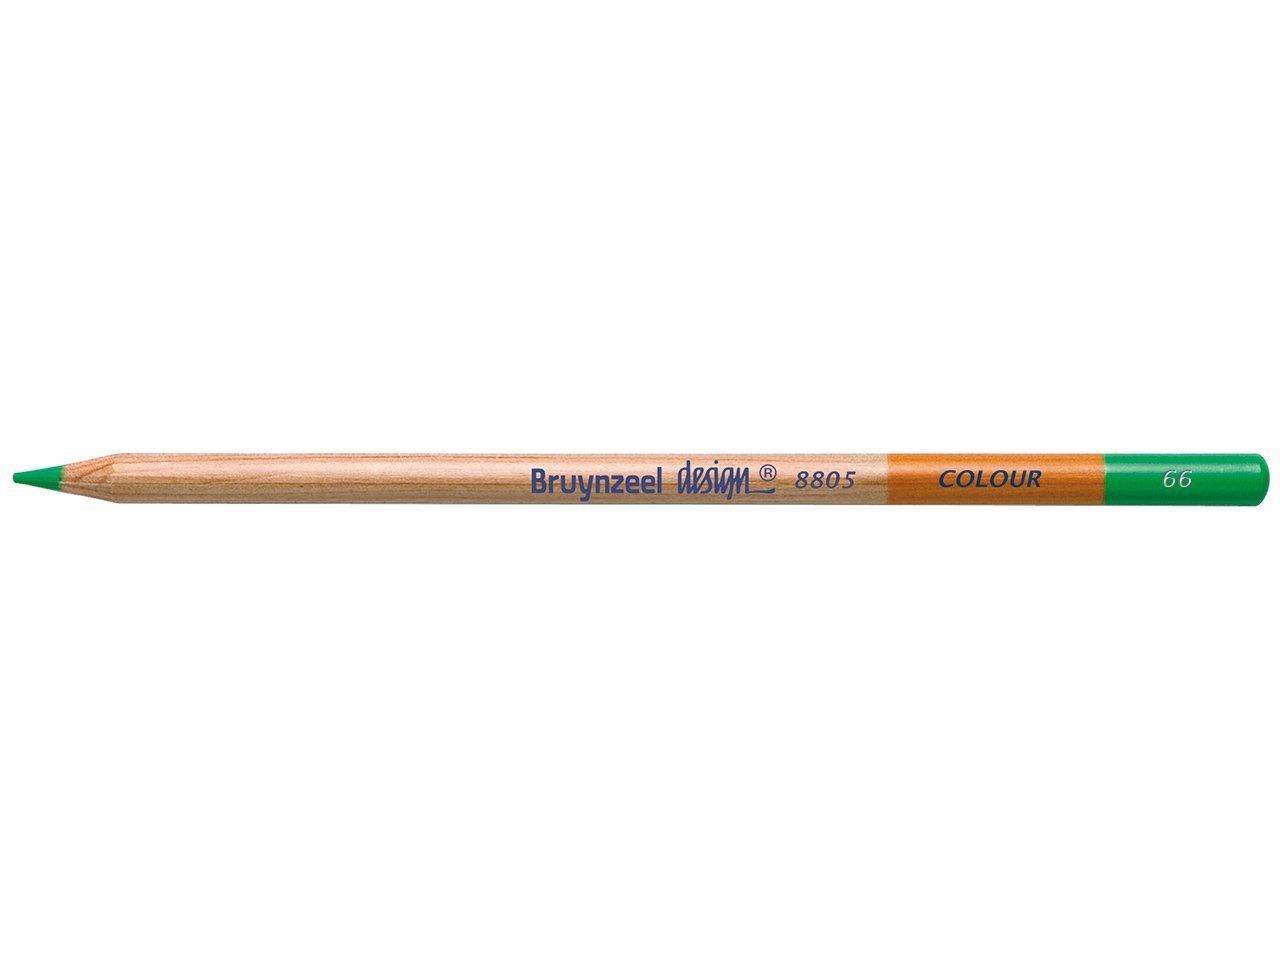 Bruynzeel Pencil - 66 Green